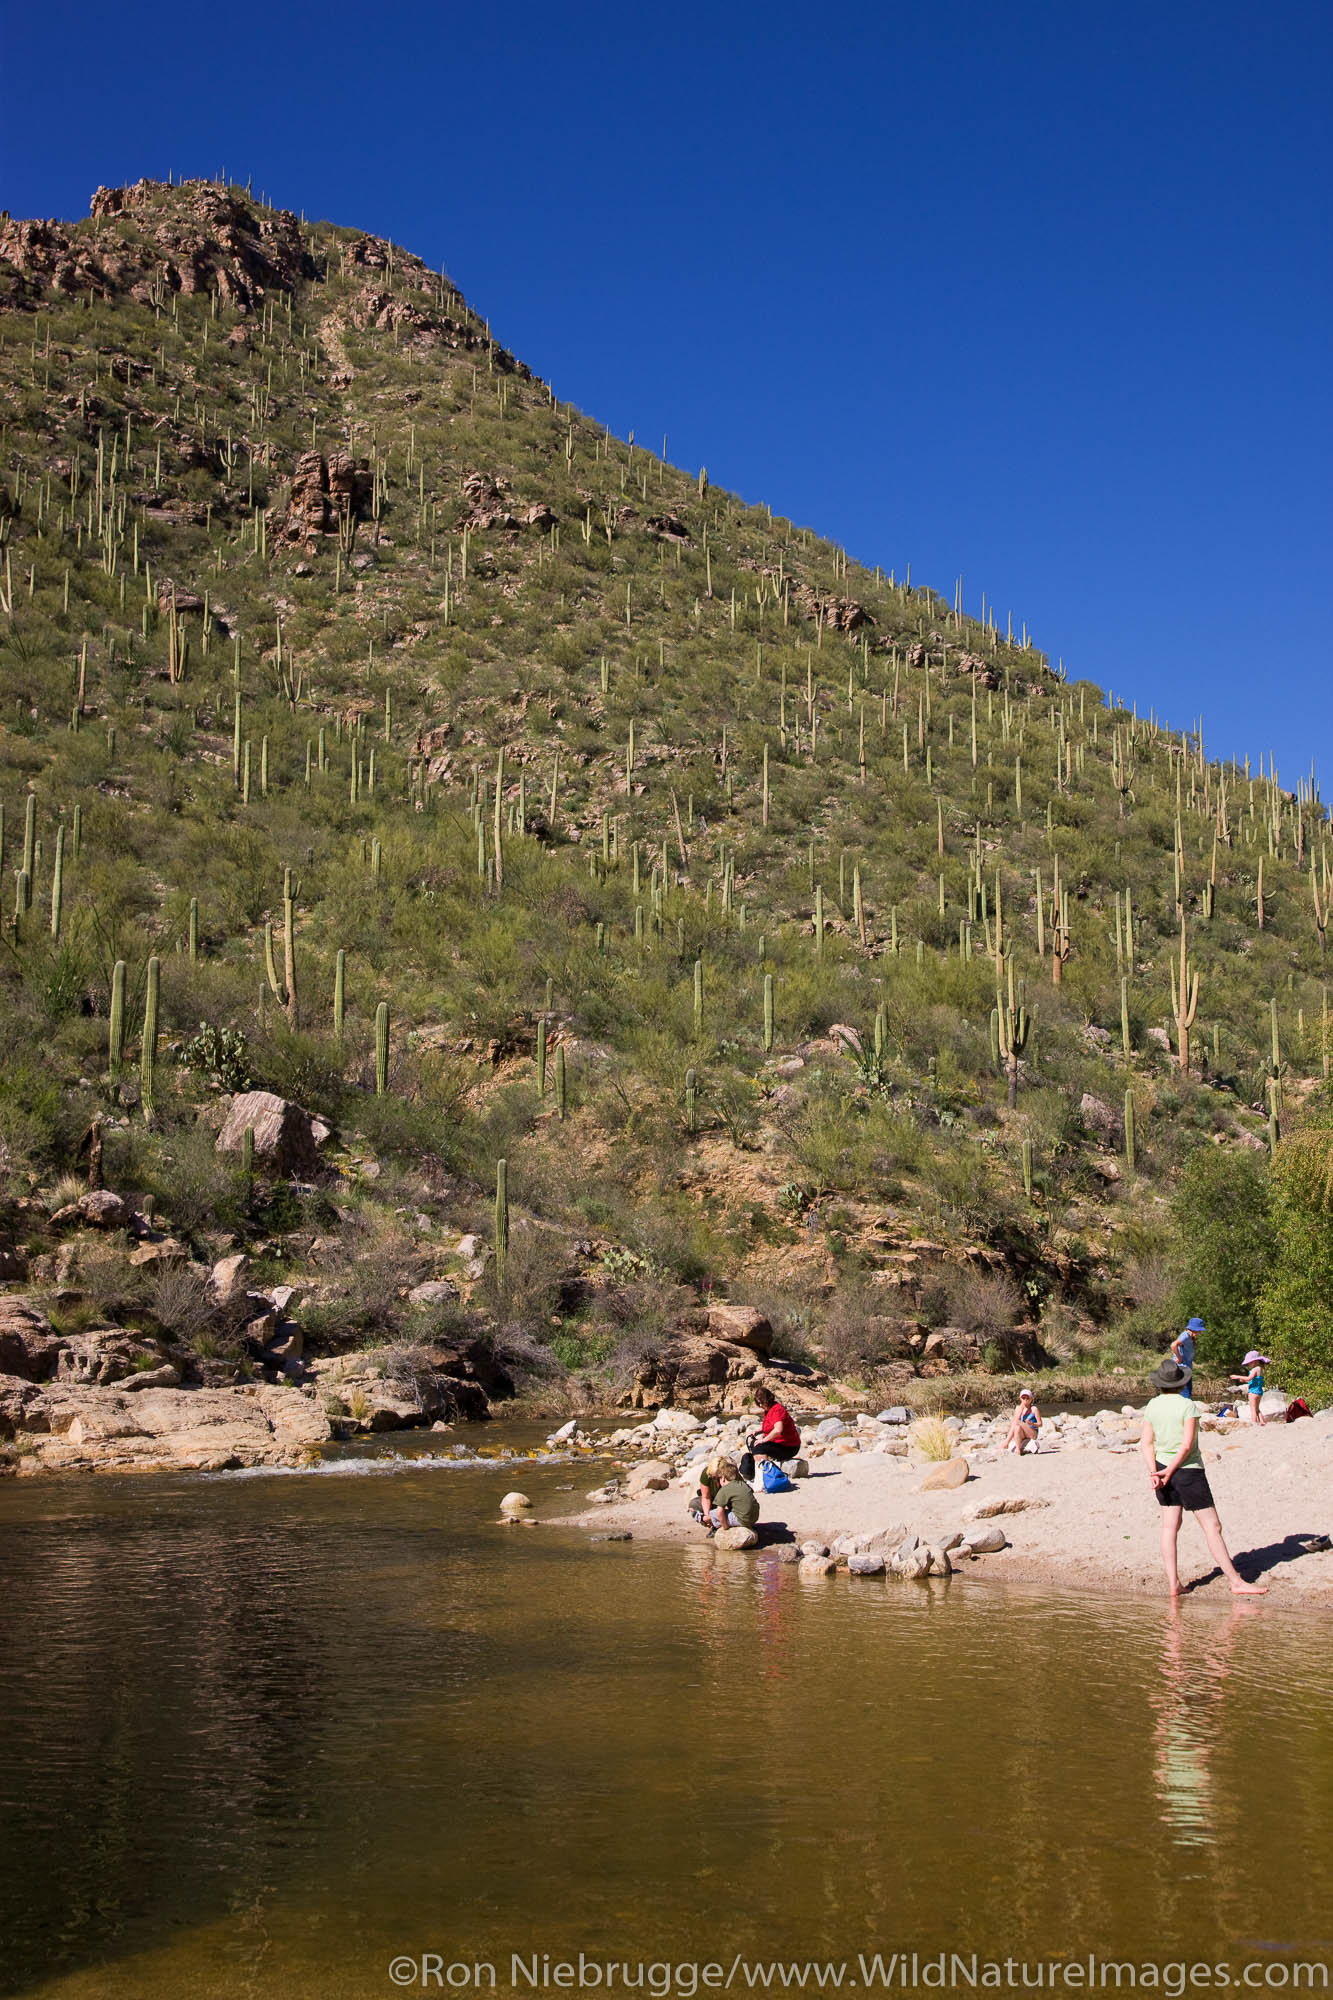 Visitors enjoy Sabino Creek, Sabino Canyon Recreation Area, Tucson, Arizona.